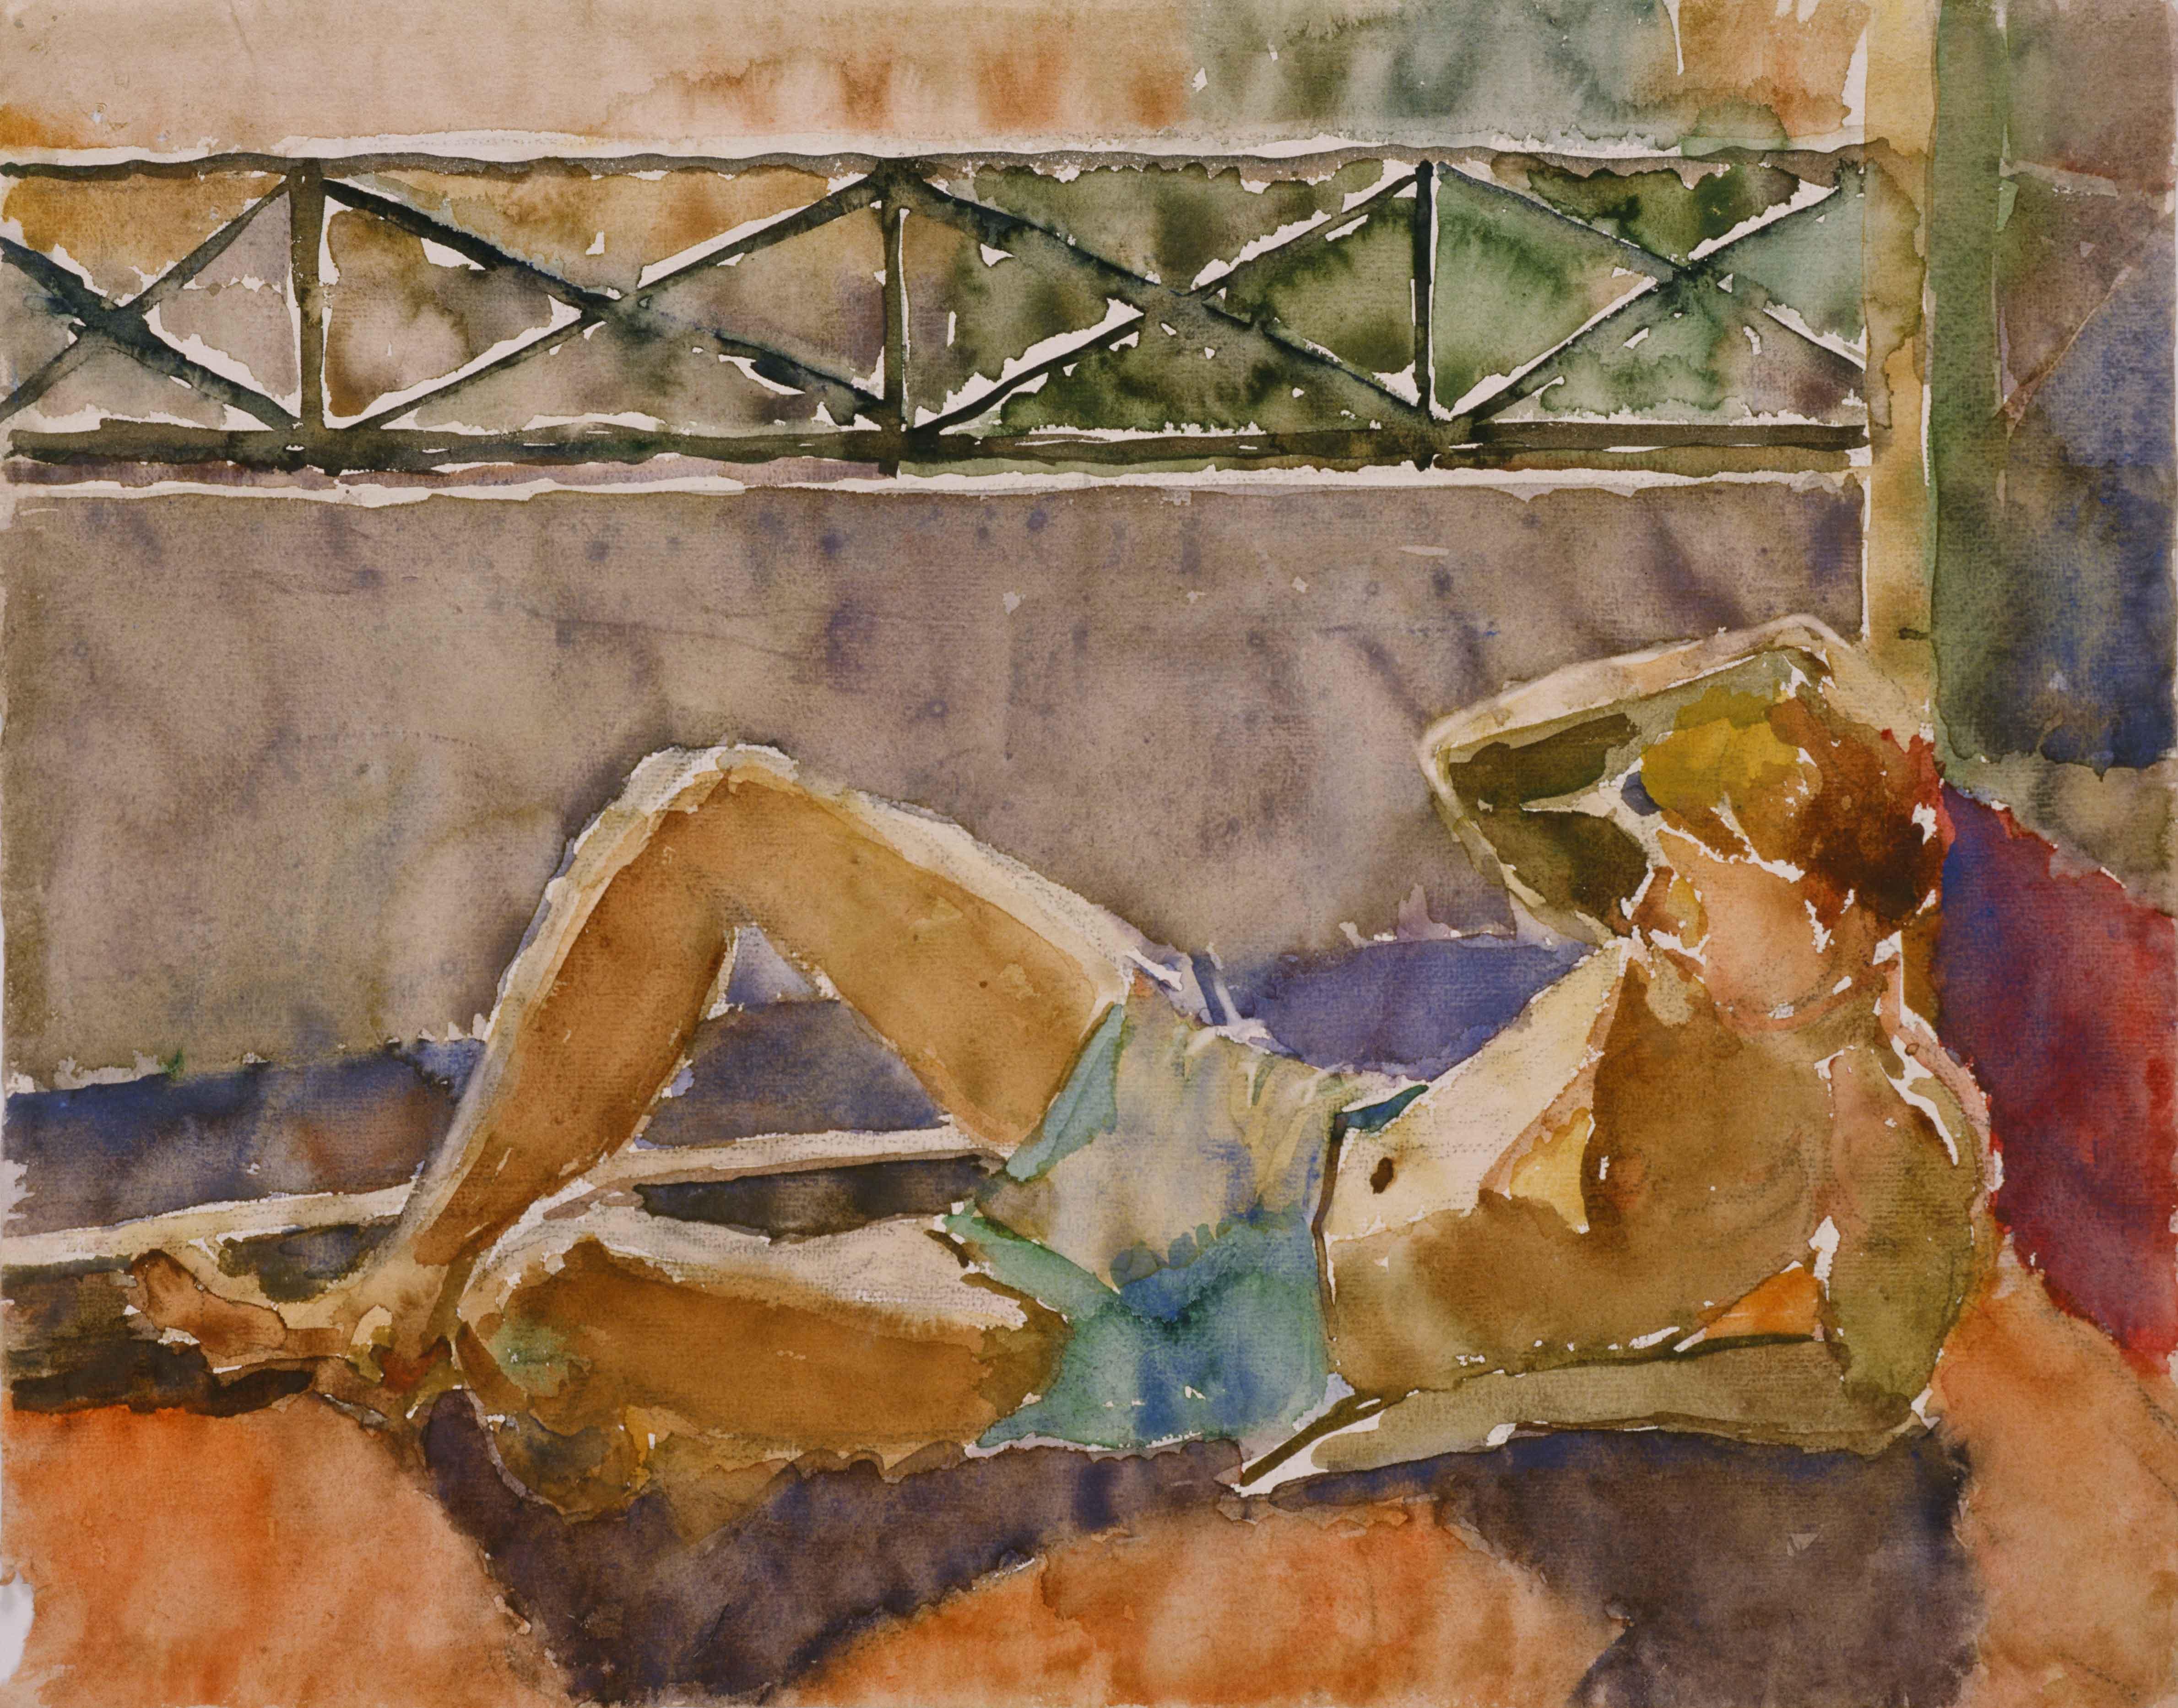 Liggende jongen op balkon